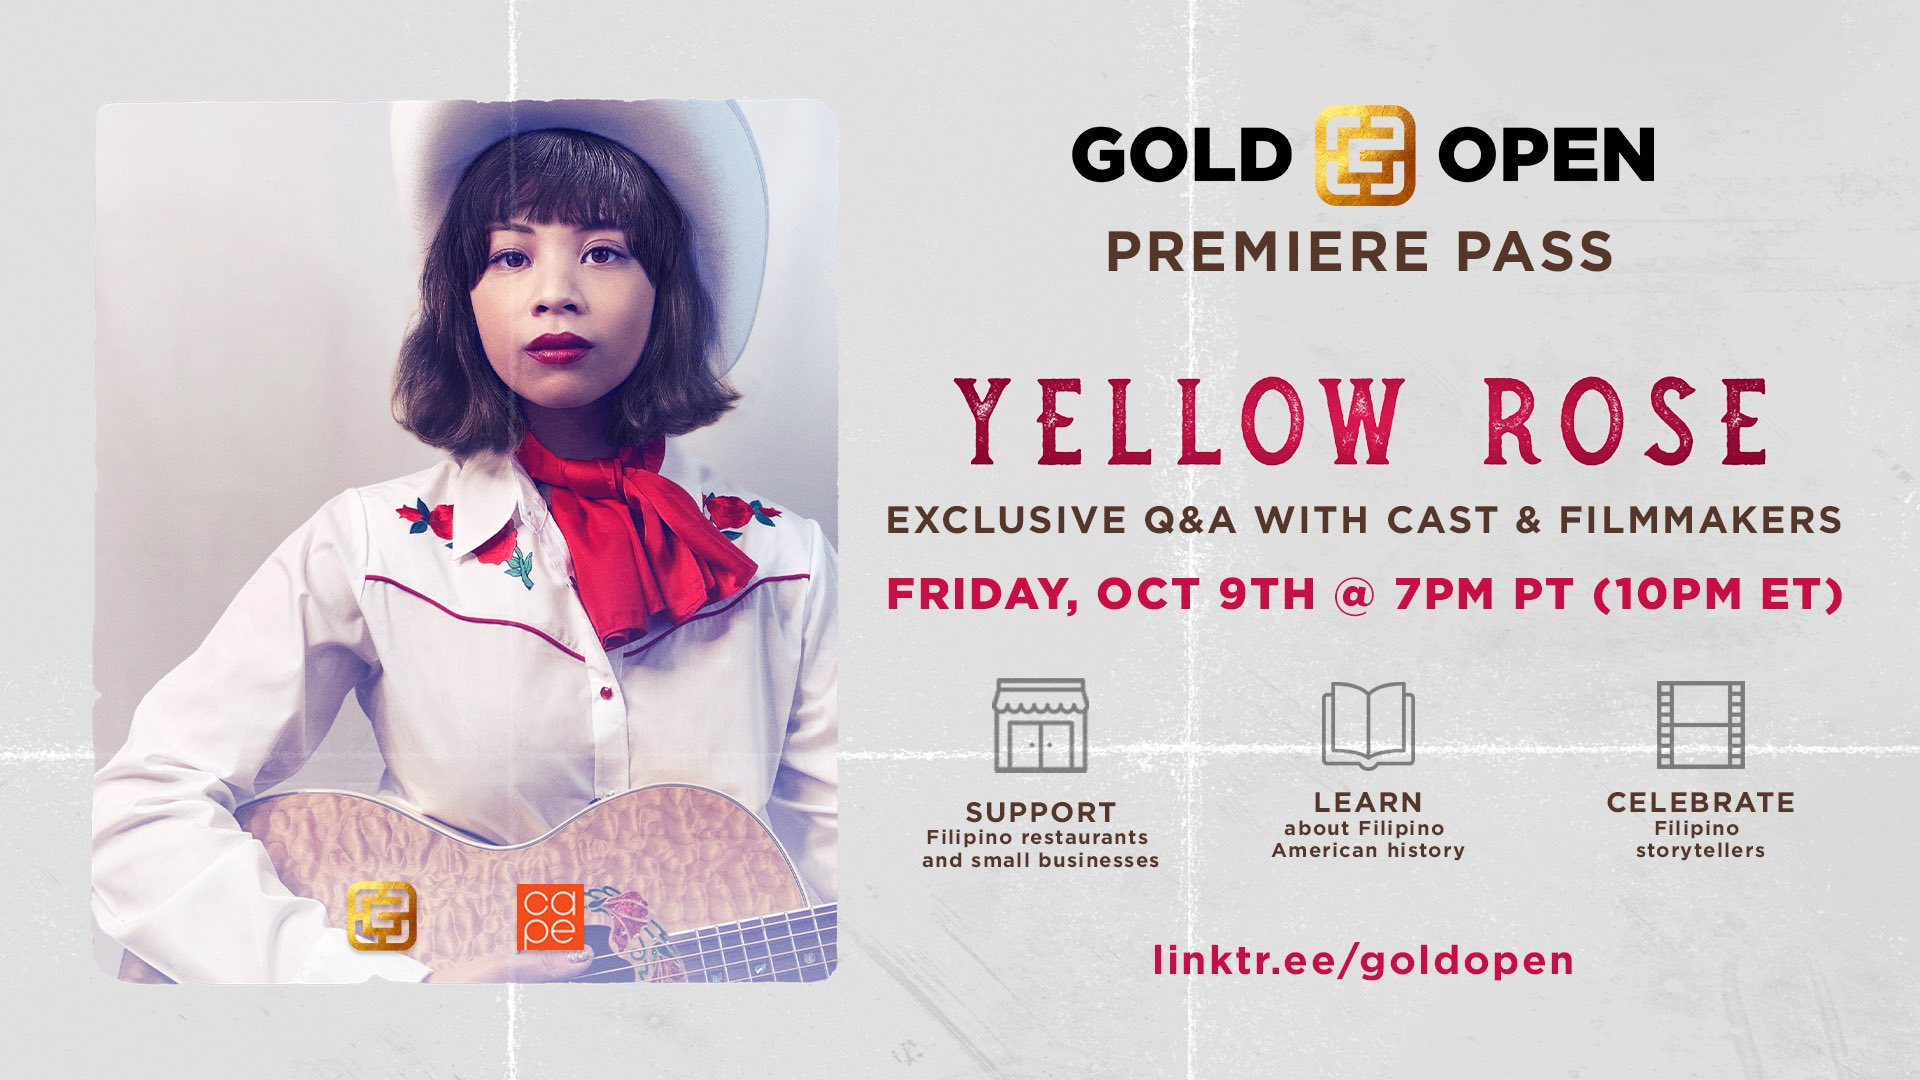 Yellow Rose #GoldOpen Premiere Pass Details